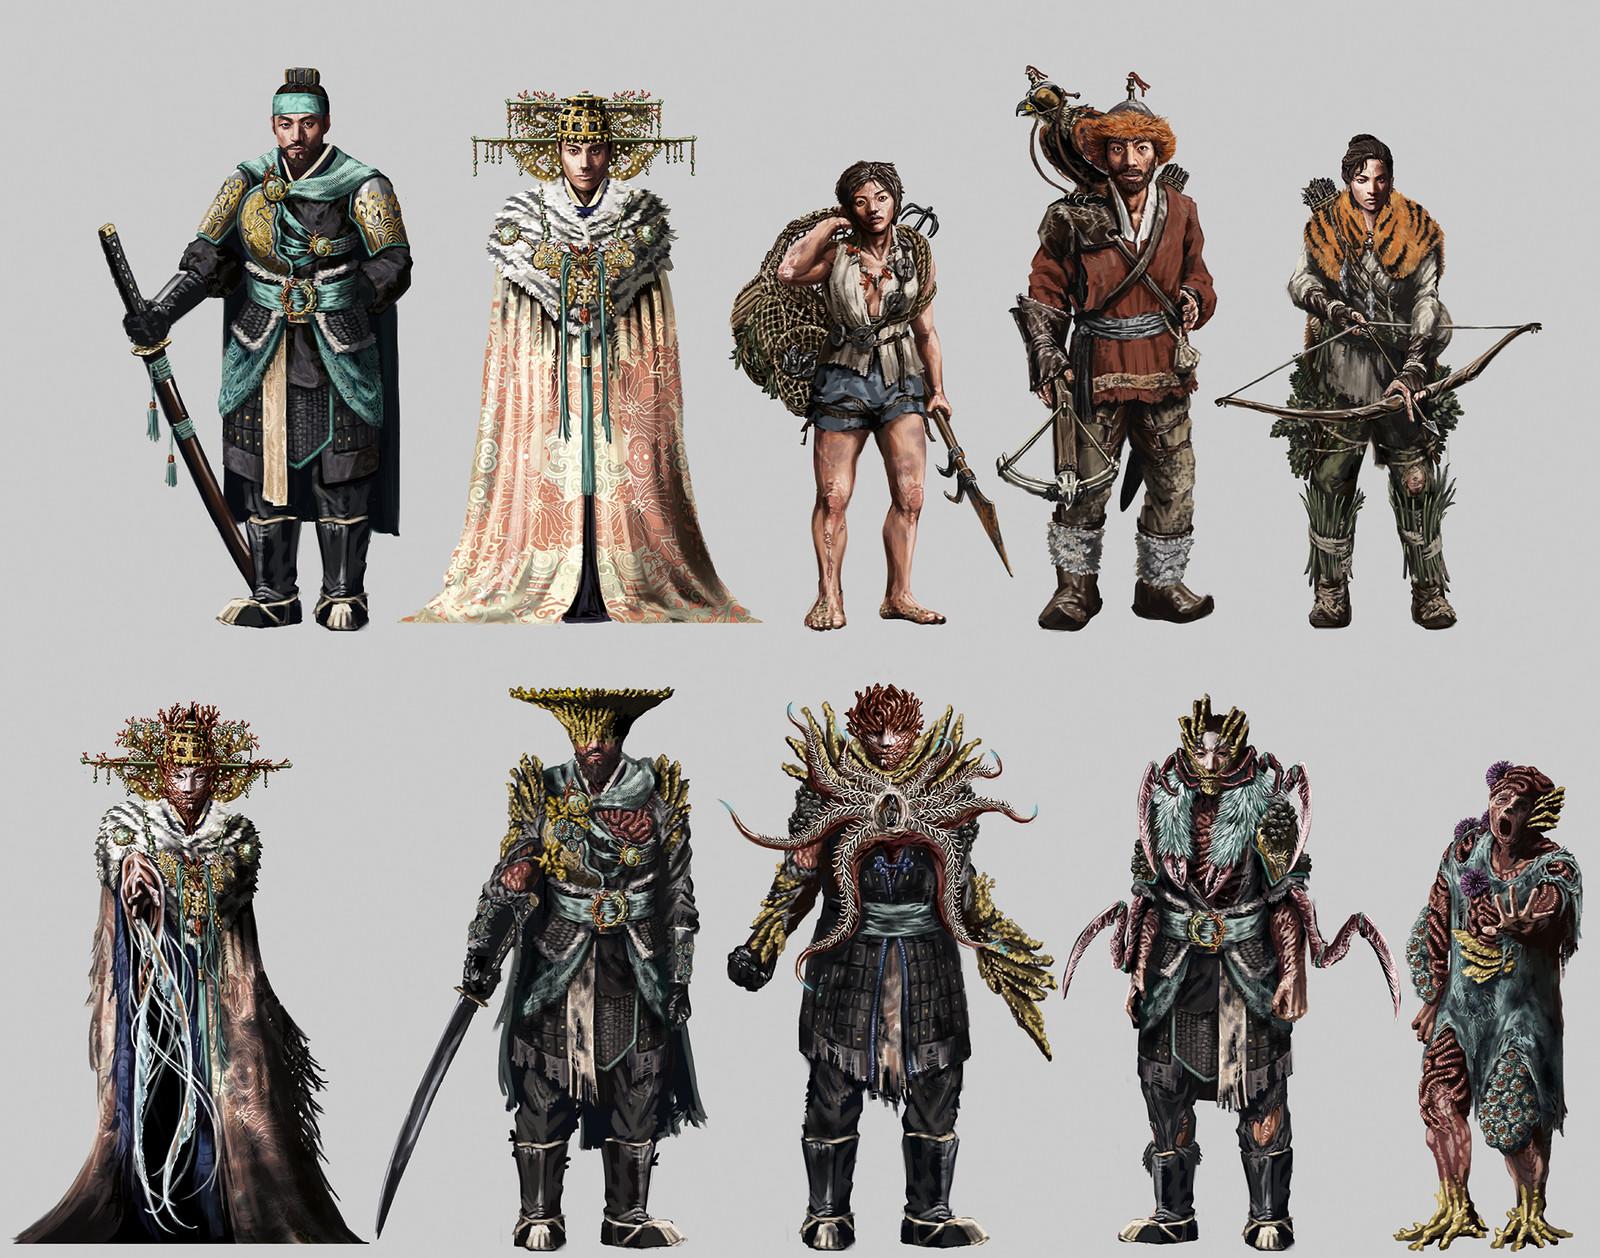 Full character lineup